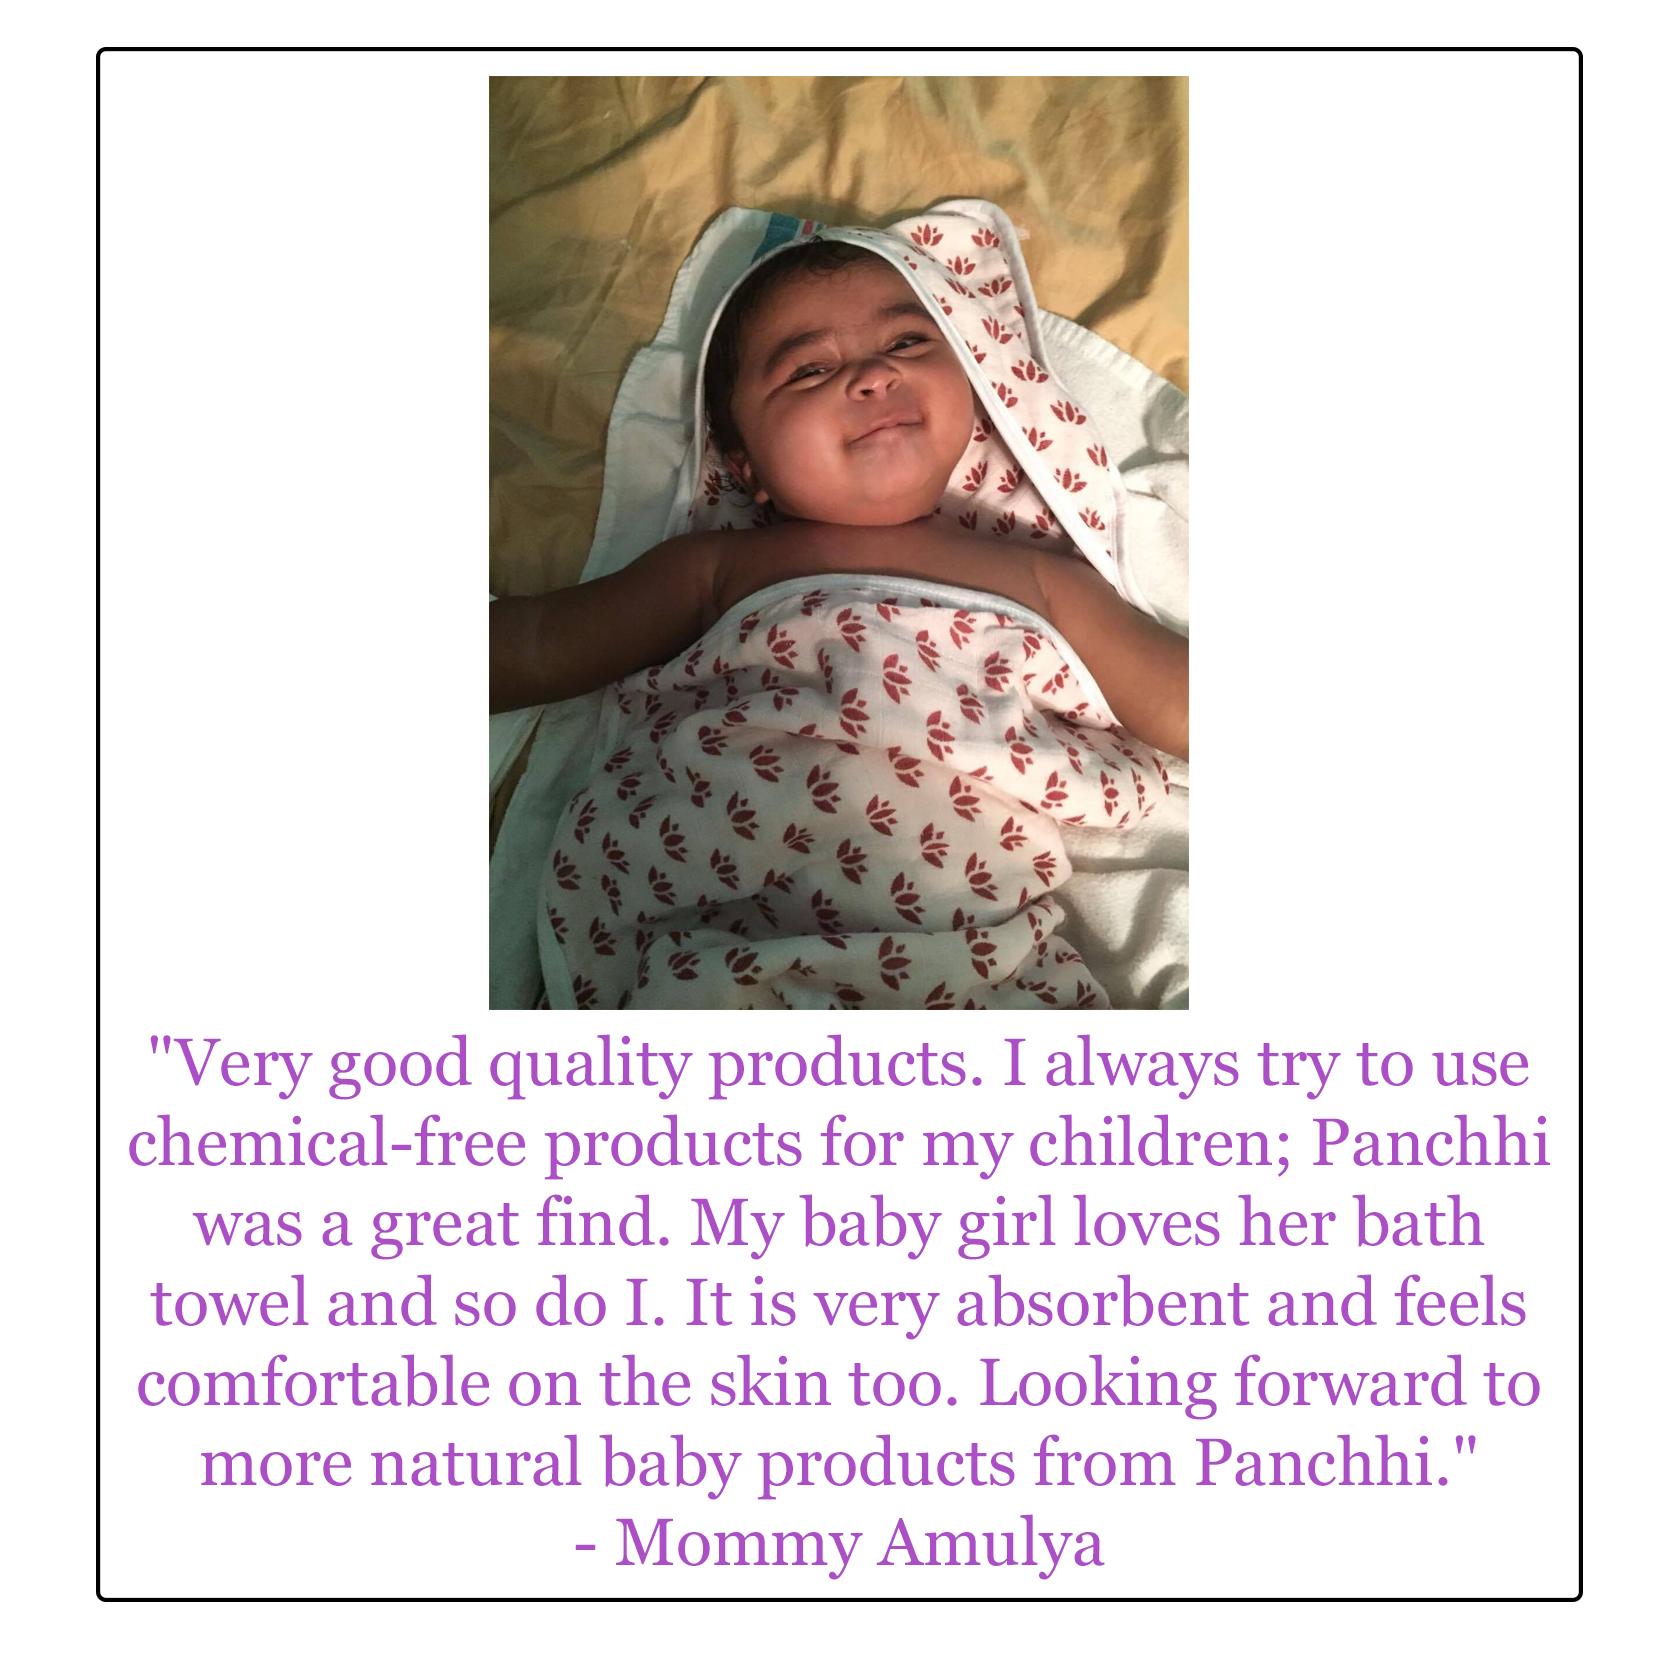 mommyamulya.png